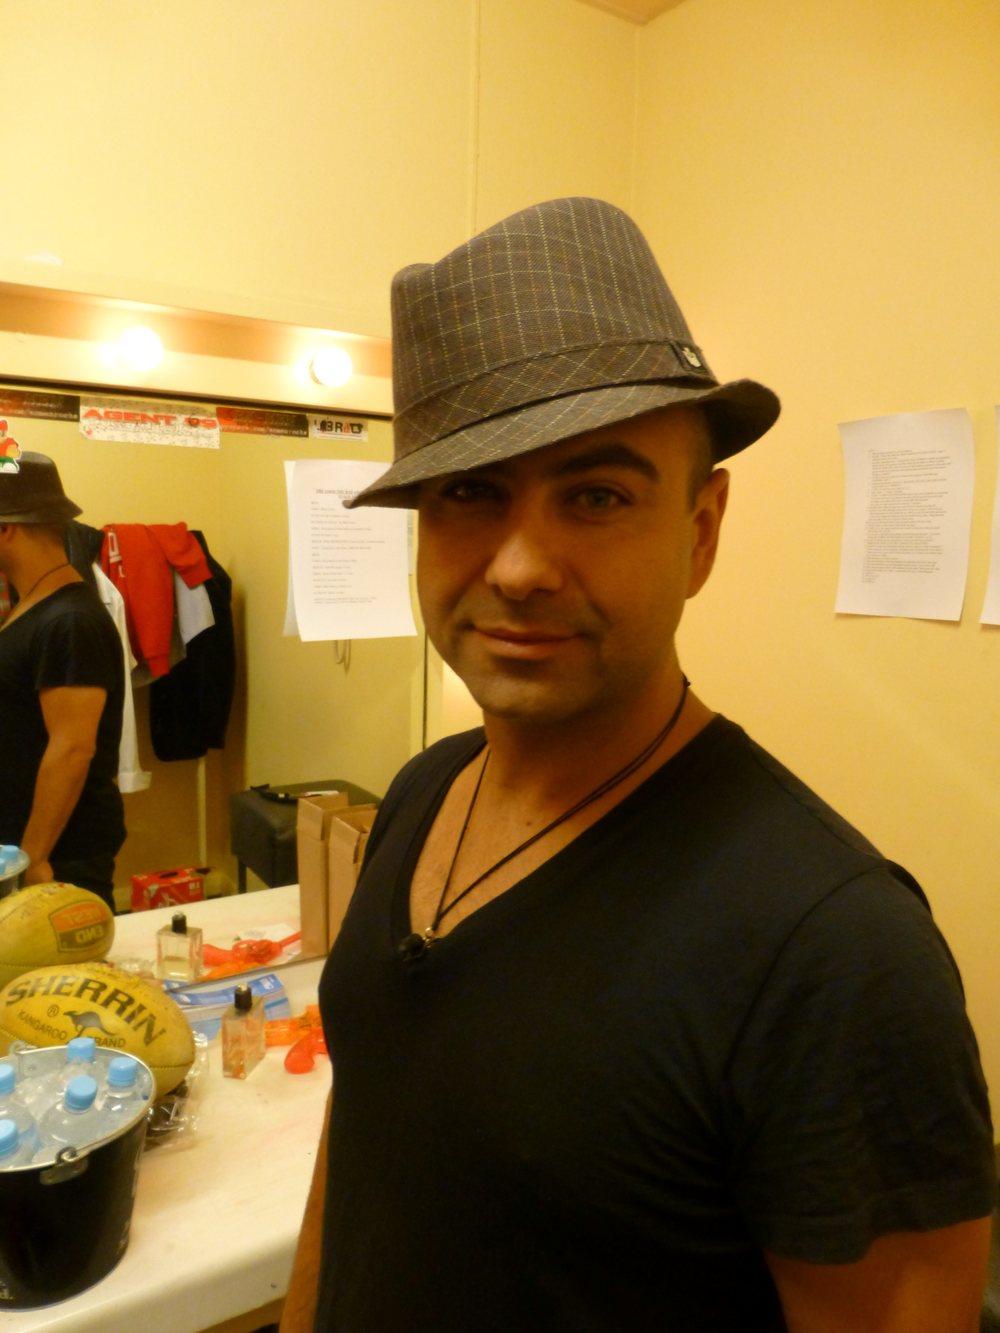 Backstage, Adelaide, Australia